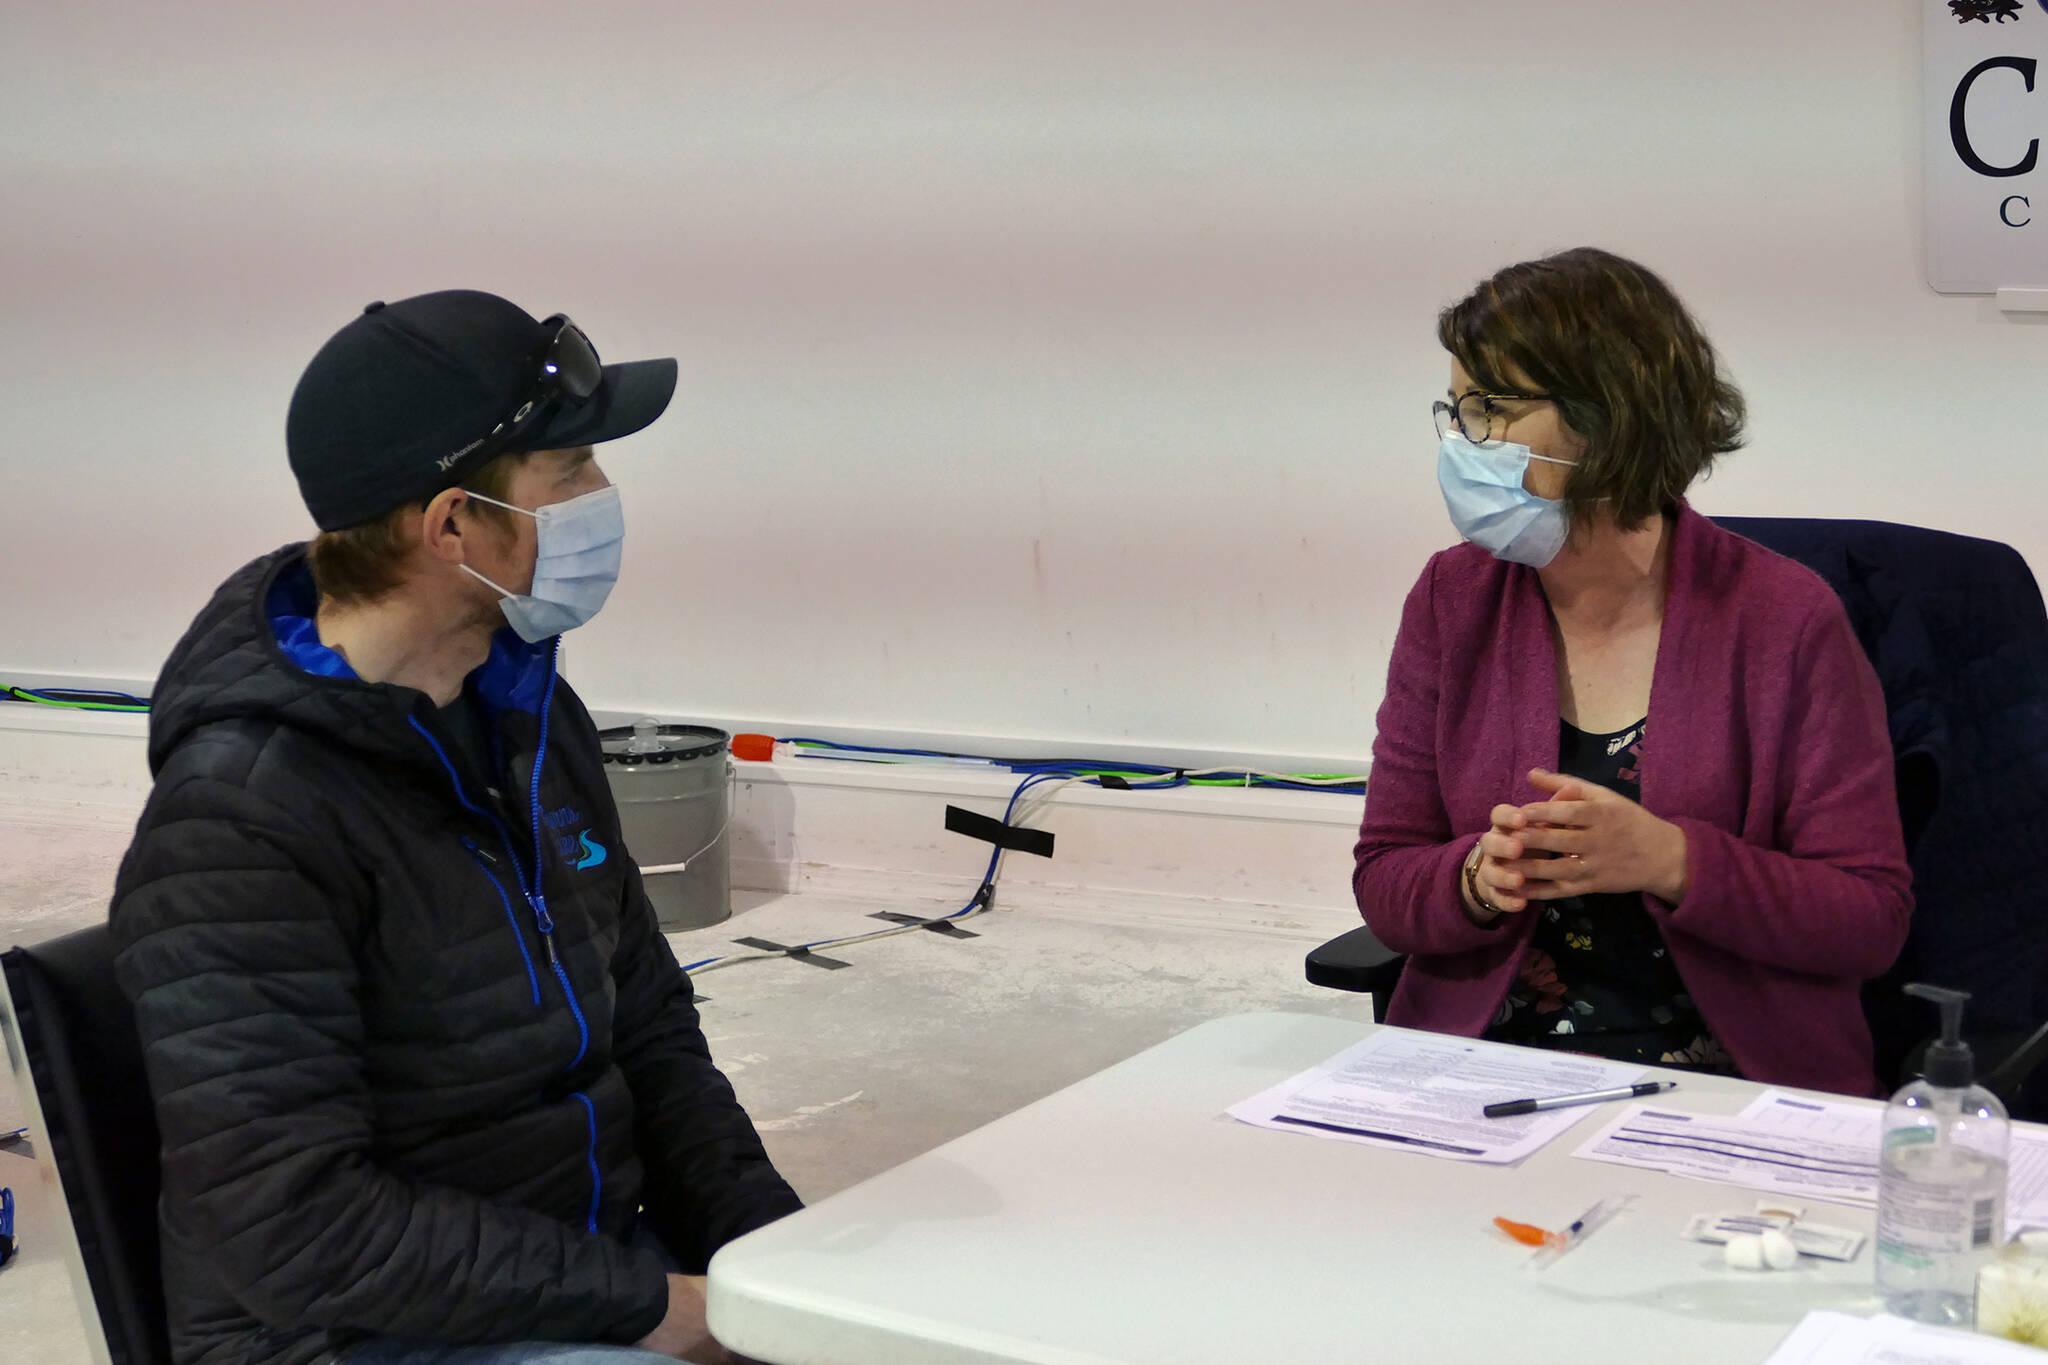 Charlie Rensby gets a COVID-19 vaccination at a clinic in Burns Lake. (Priyanka Ketkar photo/Lakes District News)